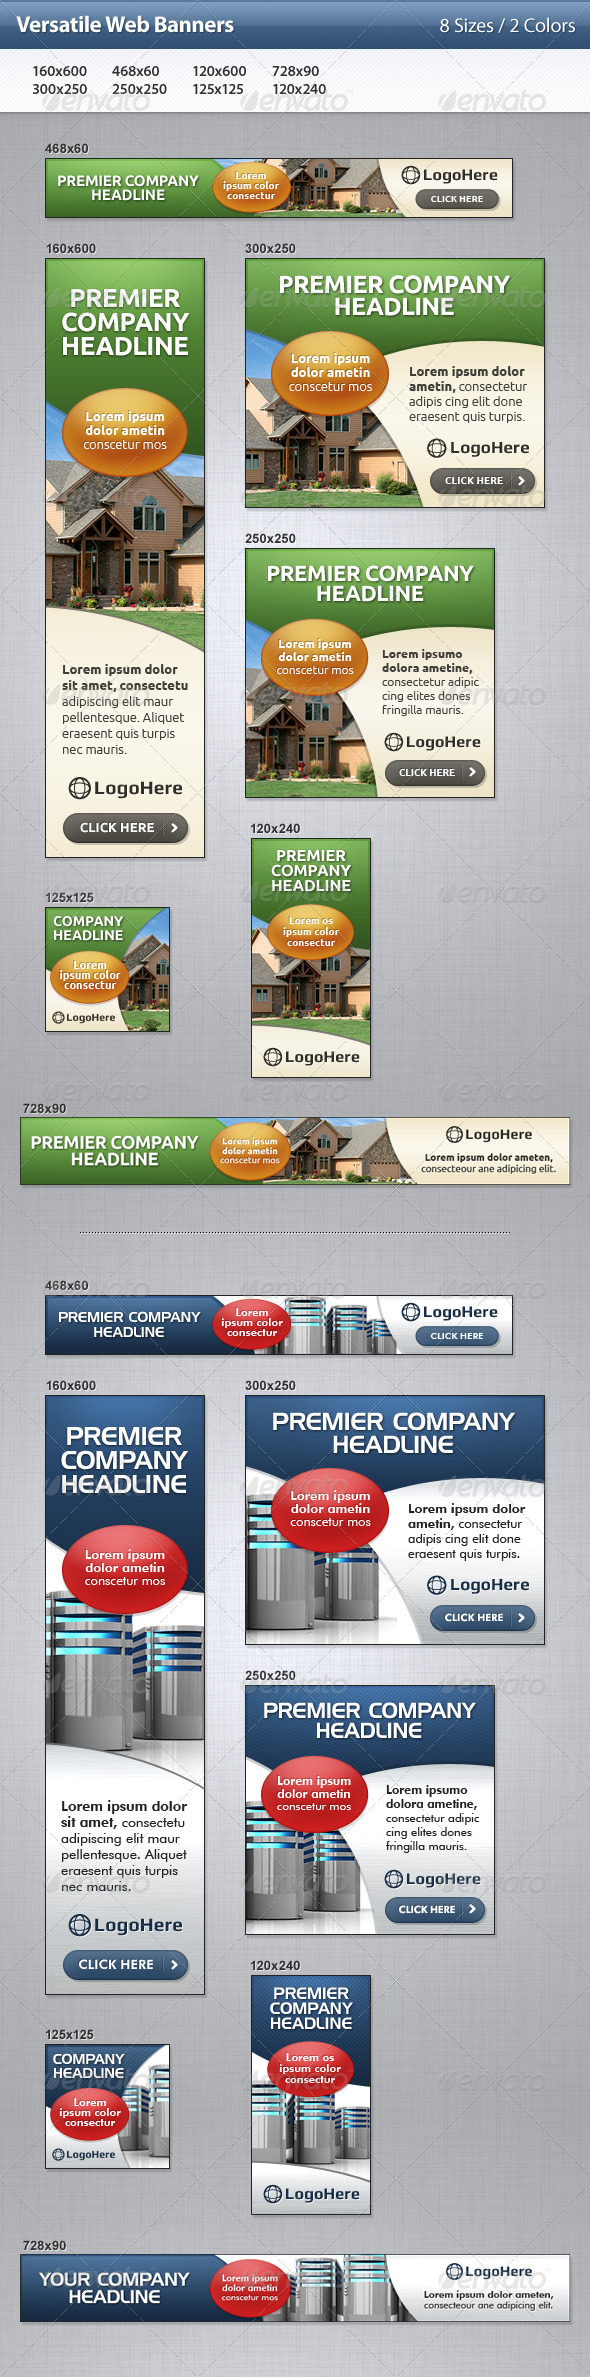 GraphicRiver Versatile Web Banners 3517357